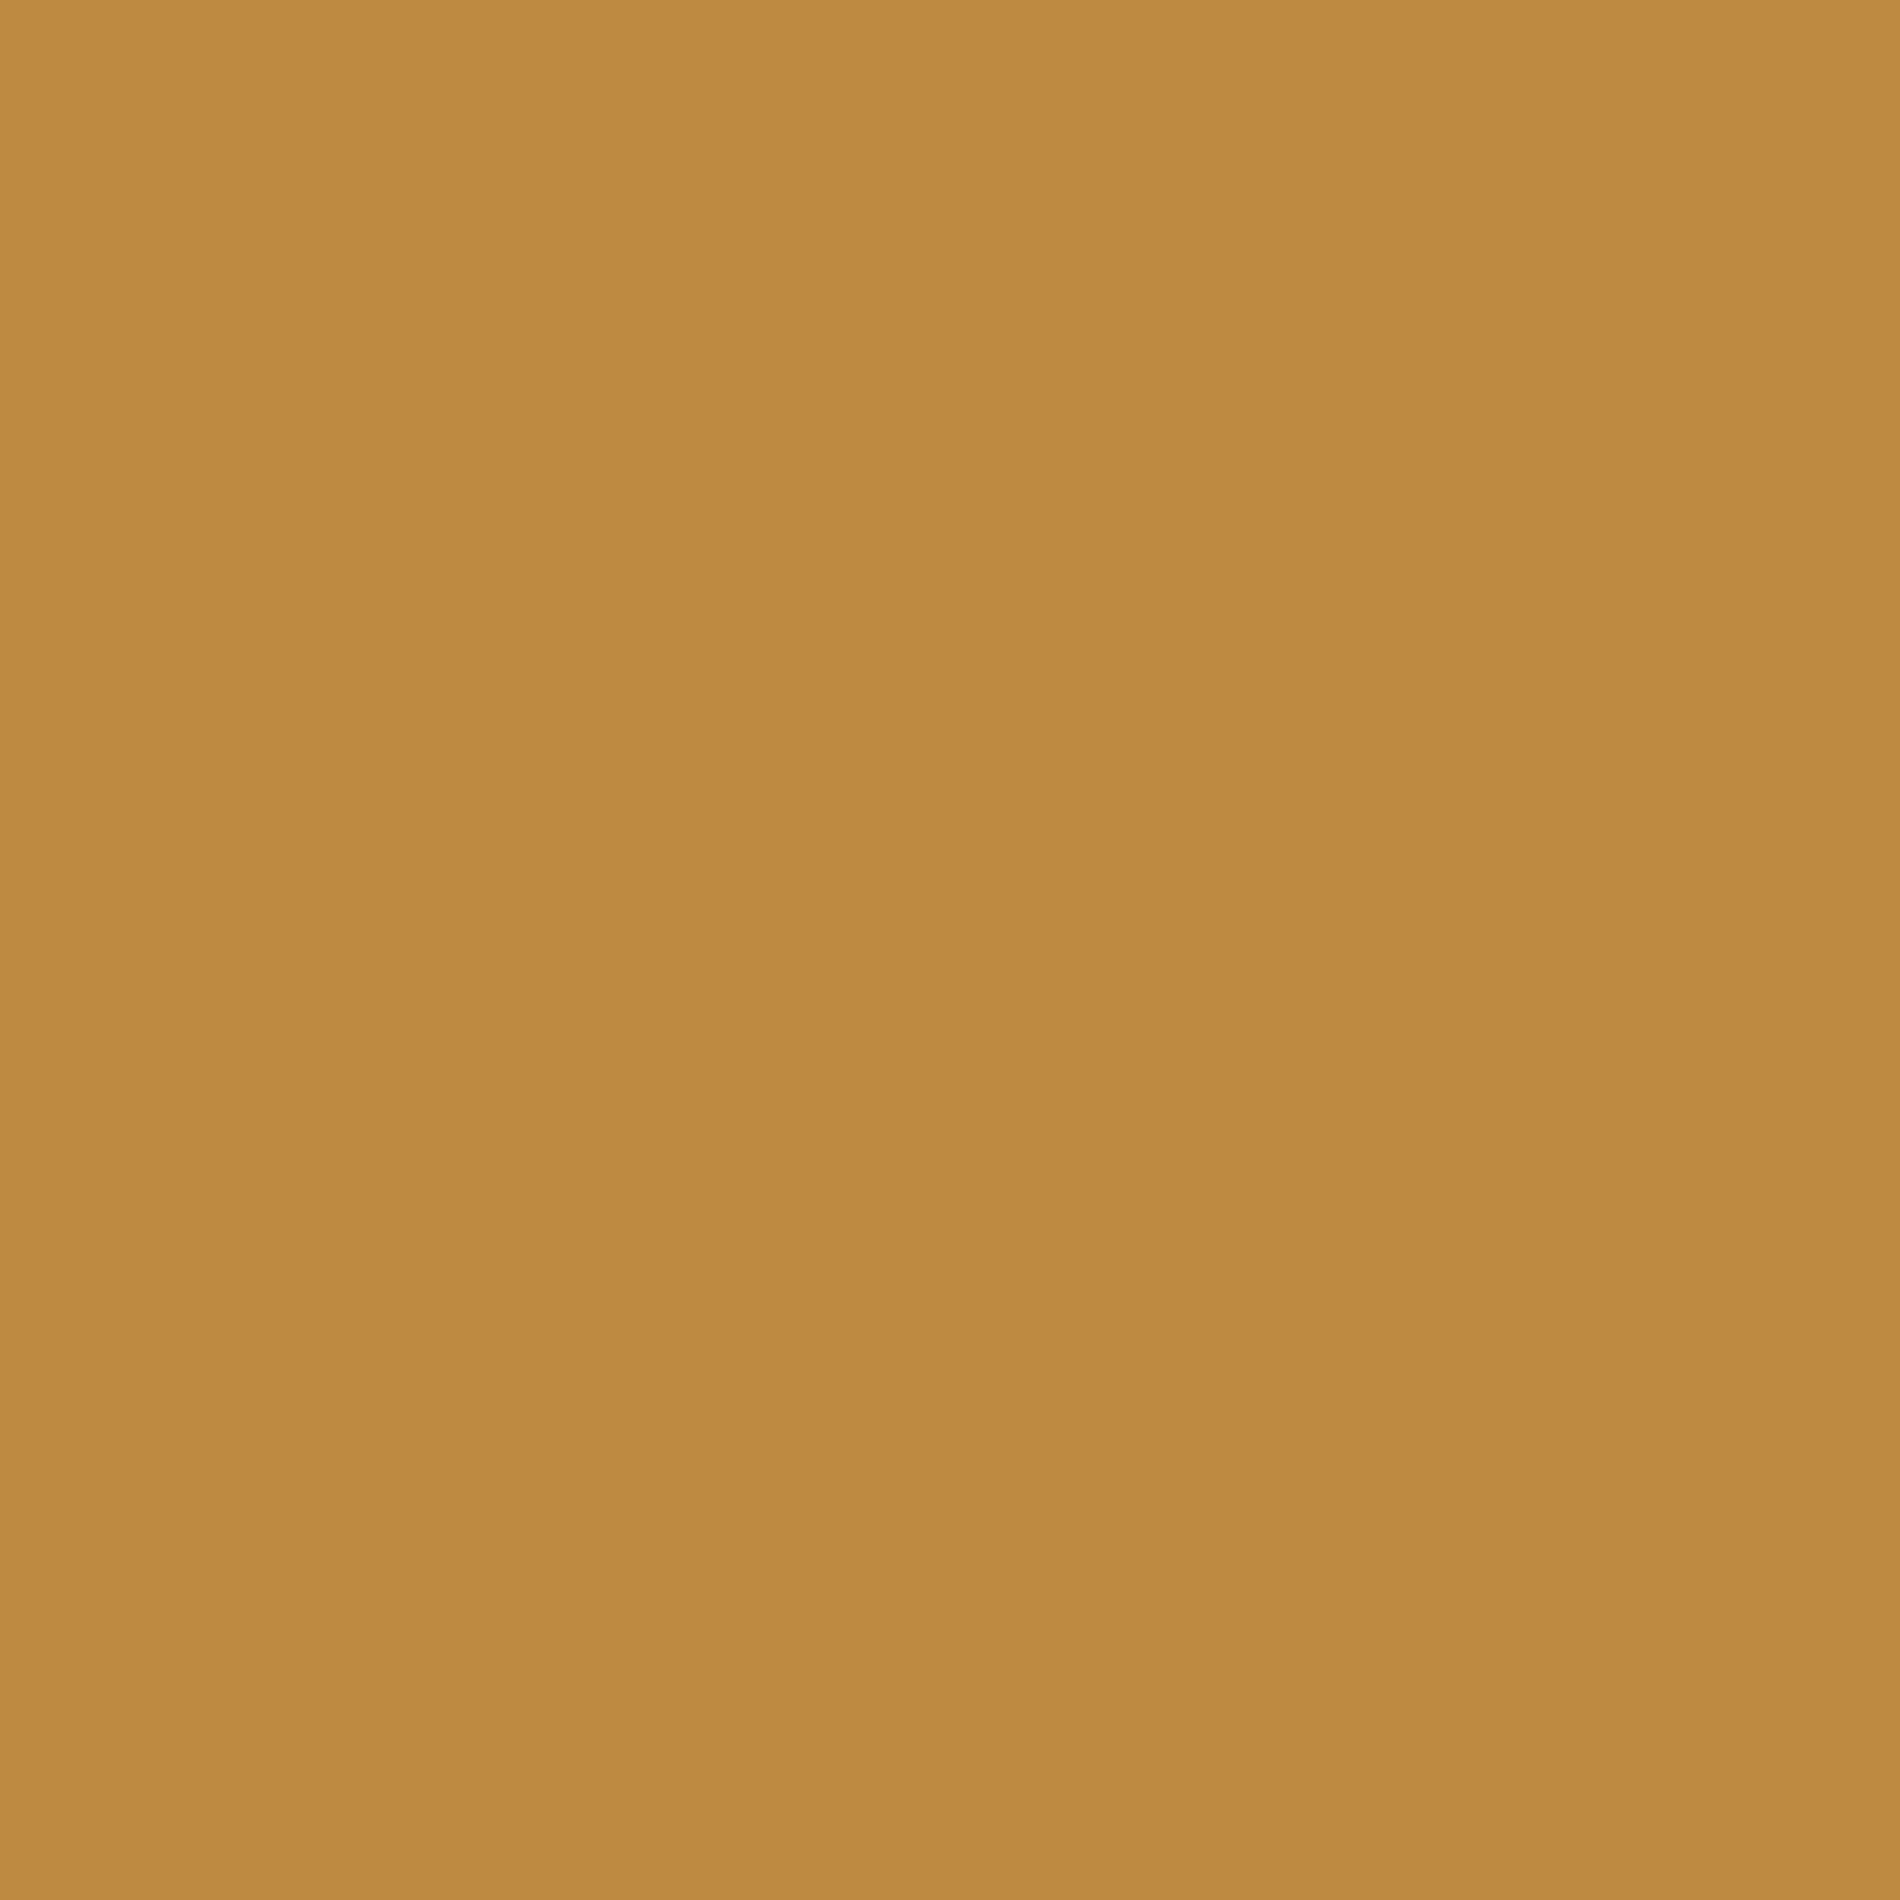 gold 40